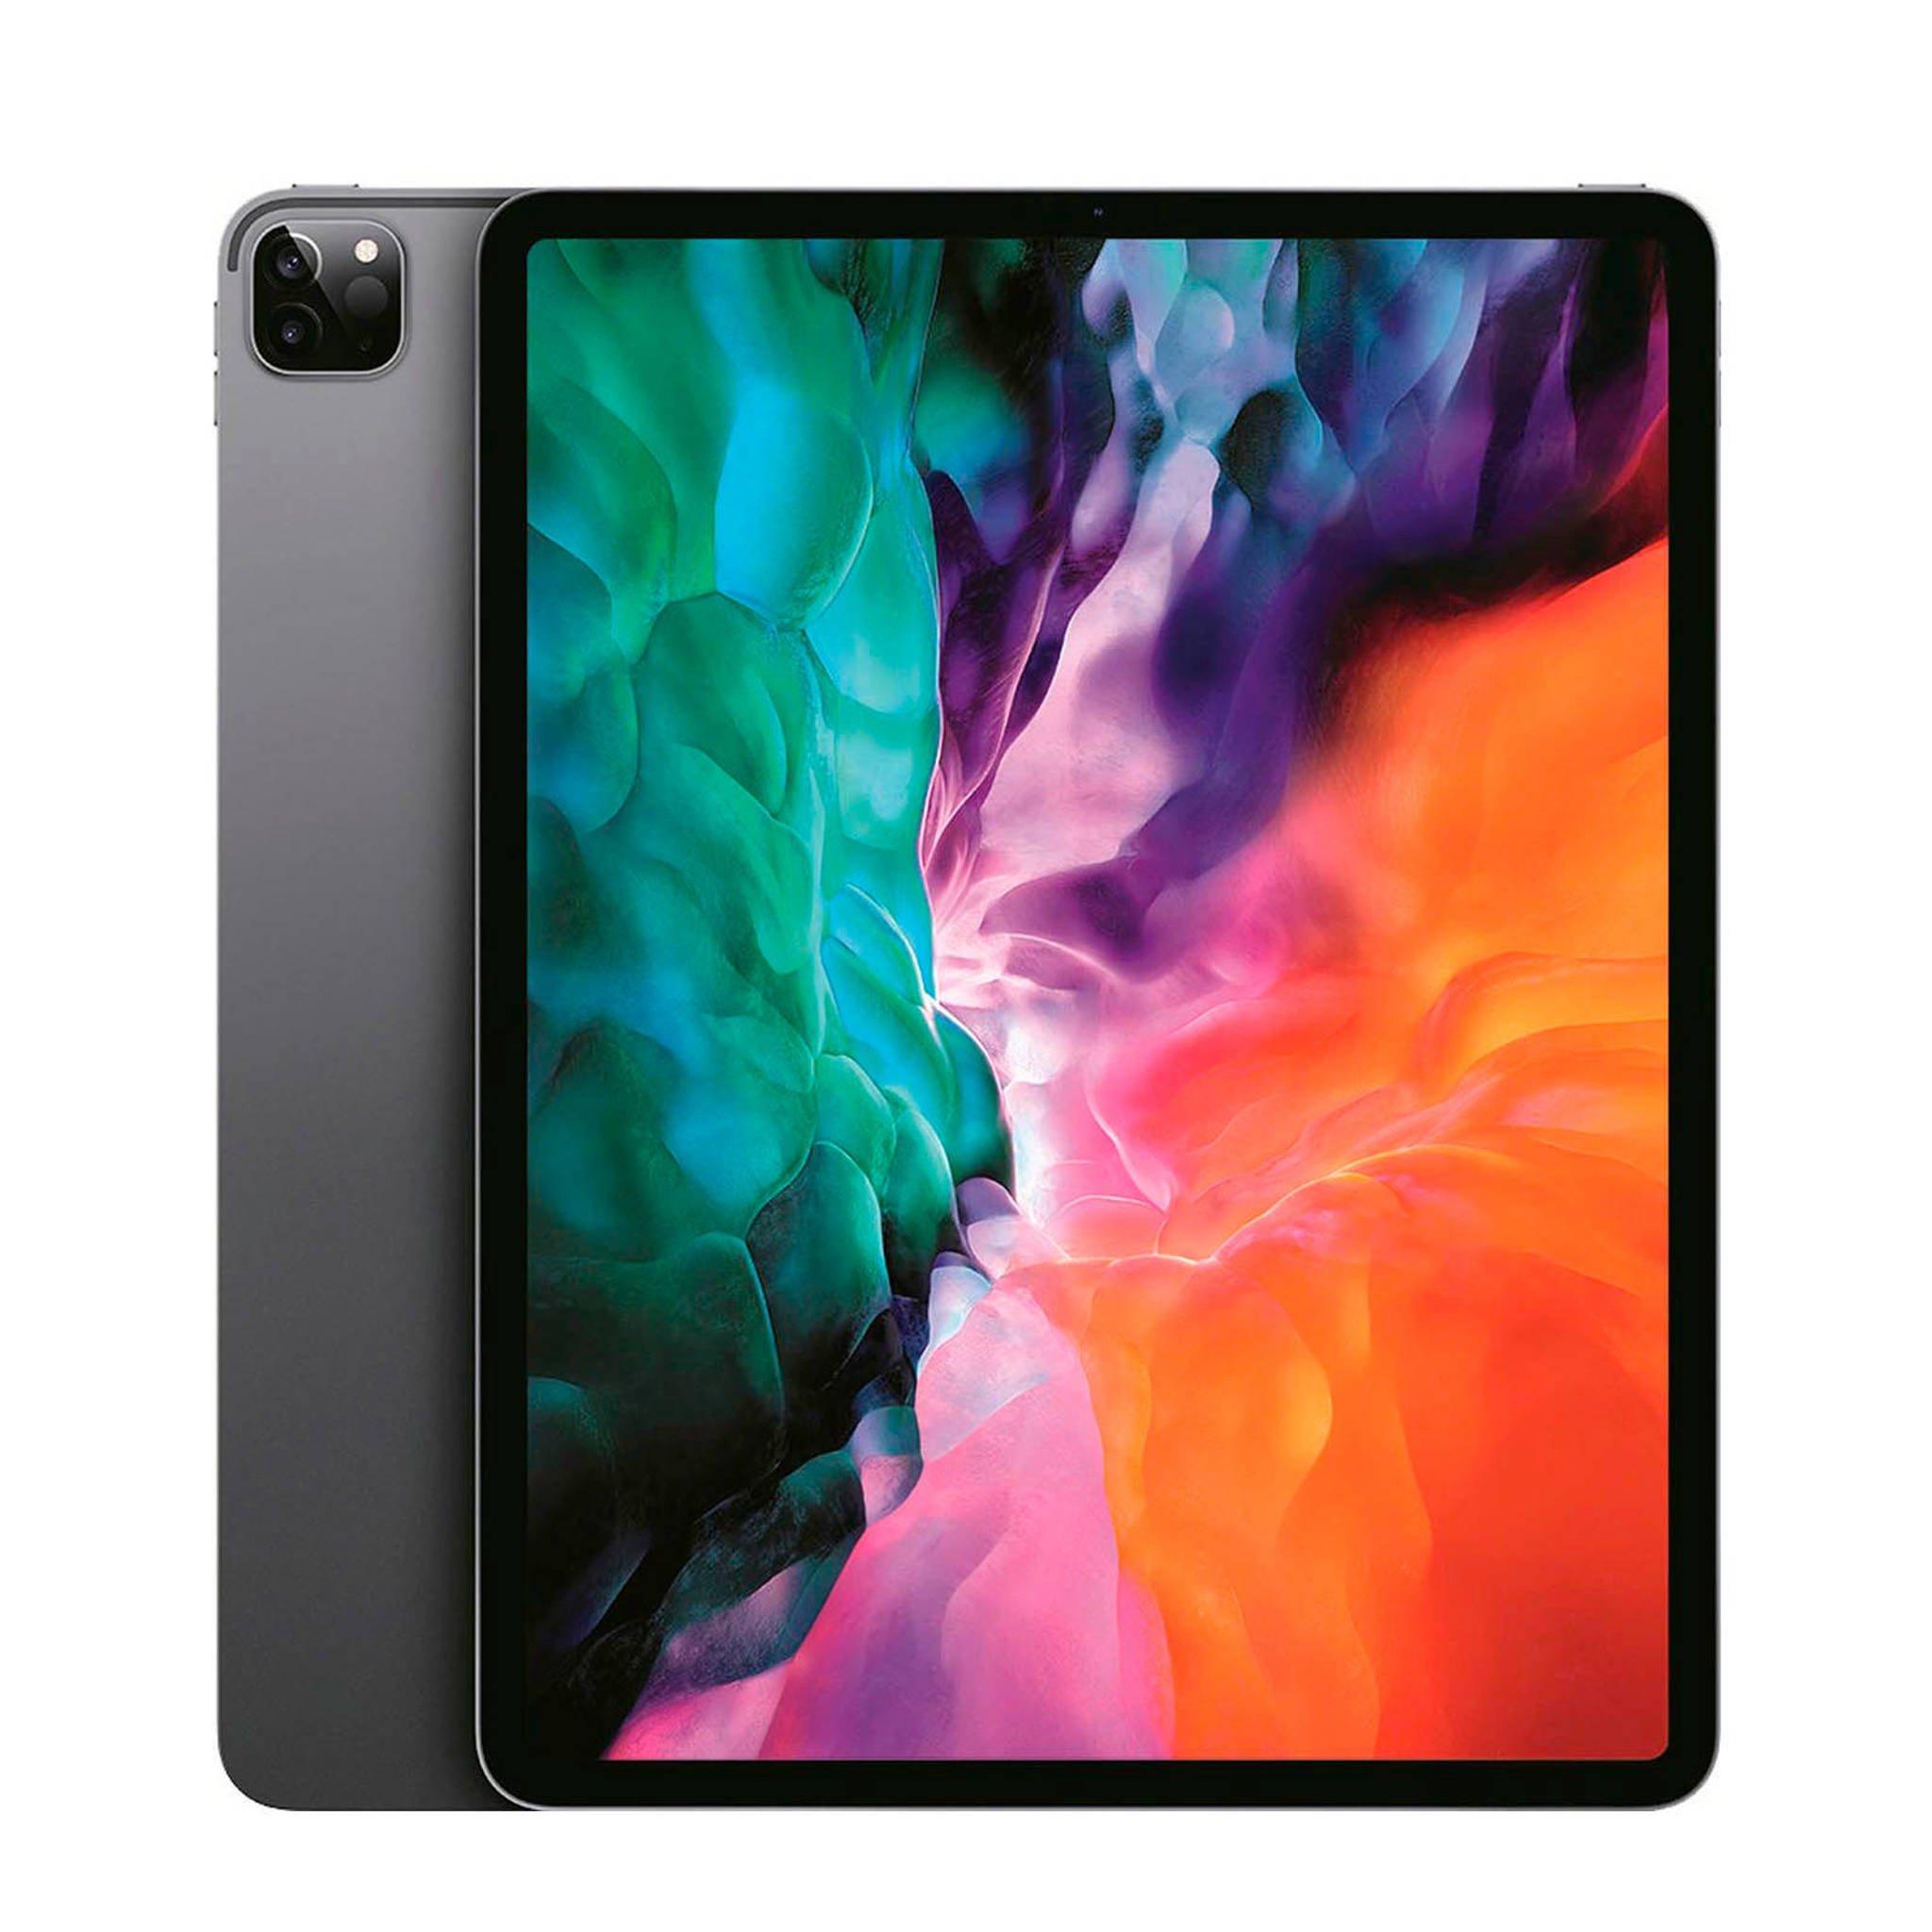 Apple WiFi 256 GB (Space Grey) iPad Pro 12.9 inch (2020) €879 met €51 extra korting via Wissel/CashbackXL Wehkamp cadeaubon